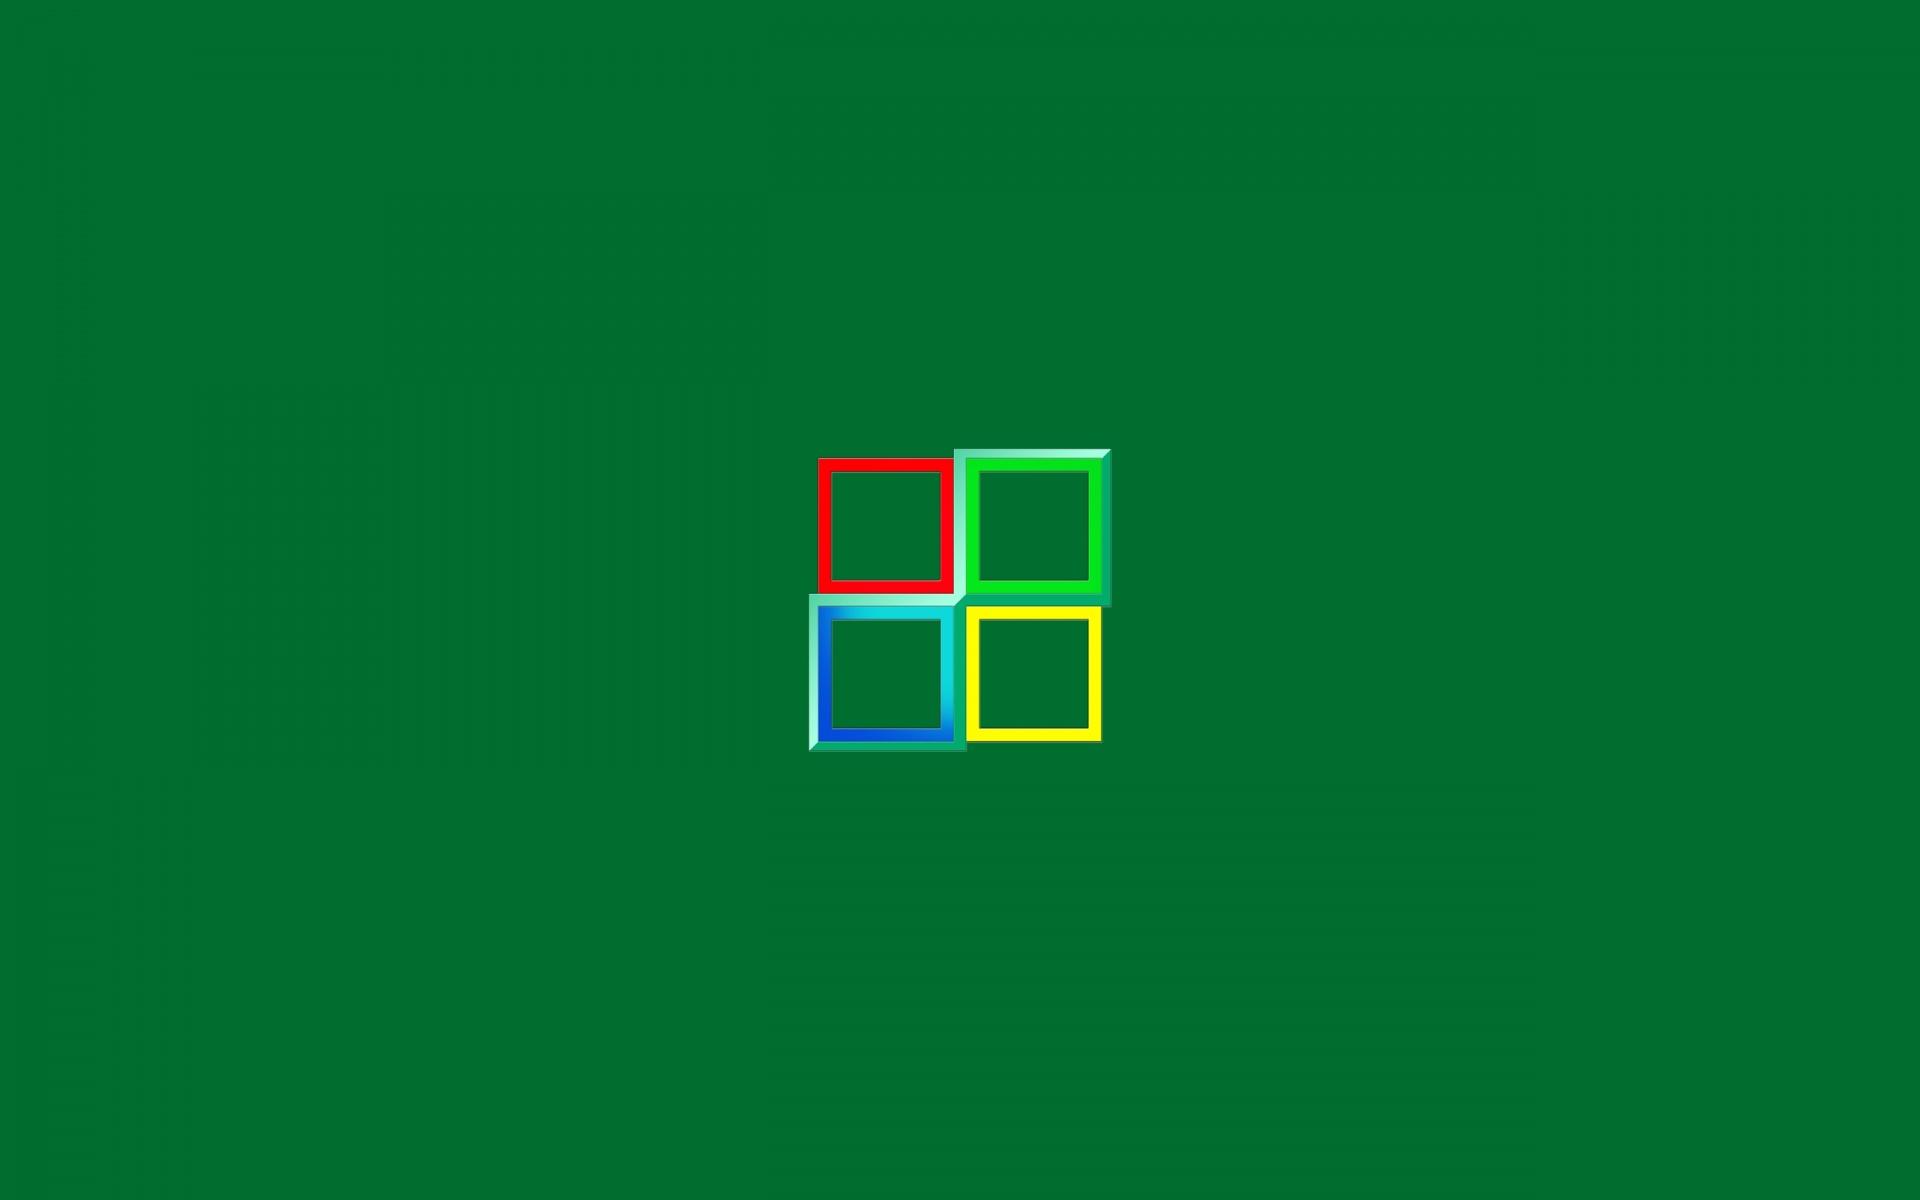 Download Windows 8 Background Windows 8 Metro Minimal Wallpaper x 1920x1200